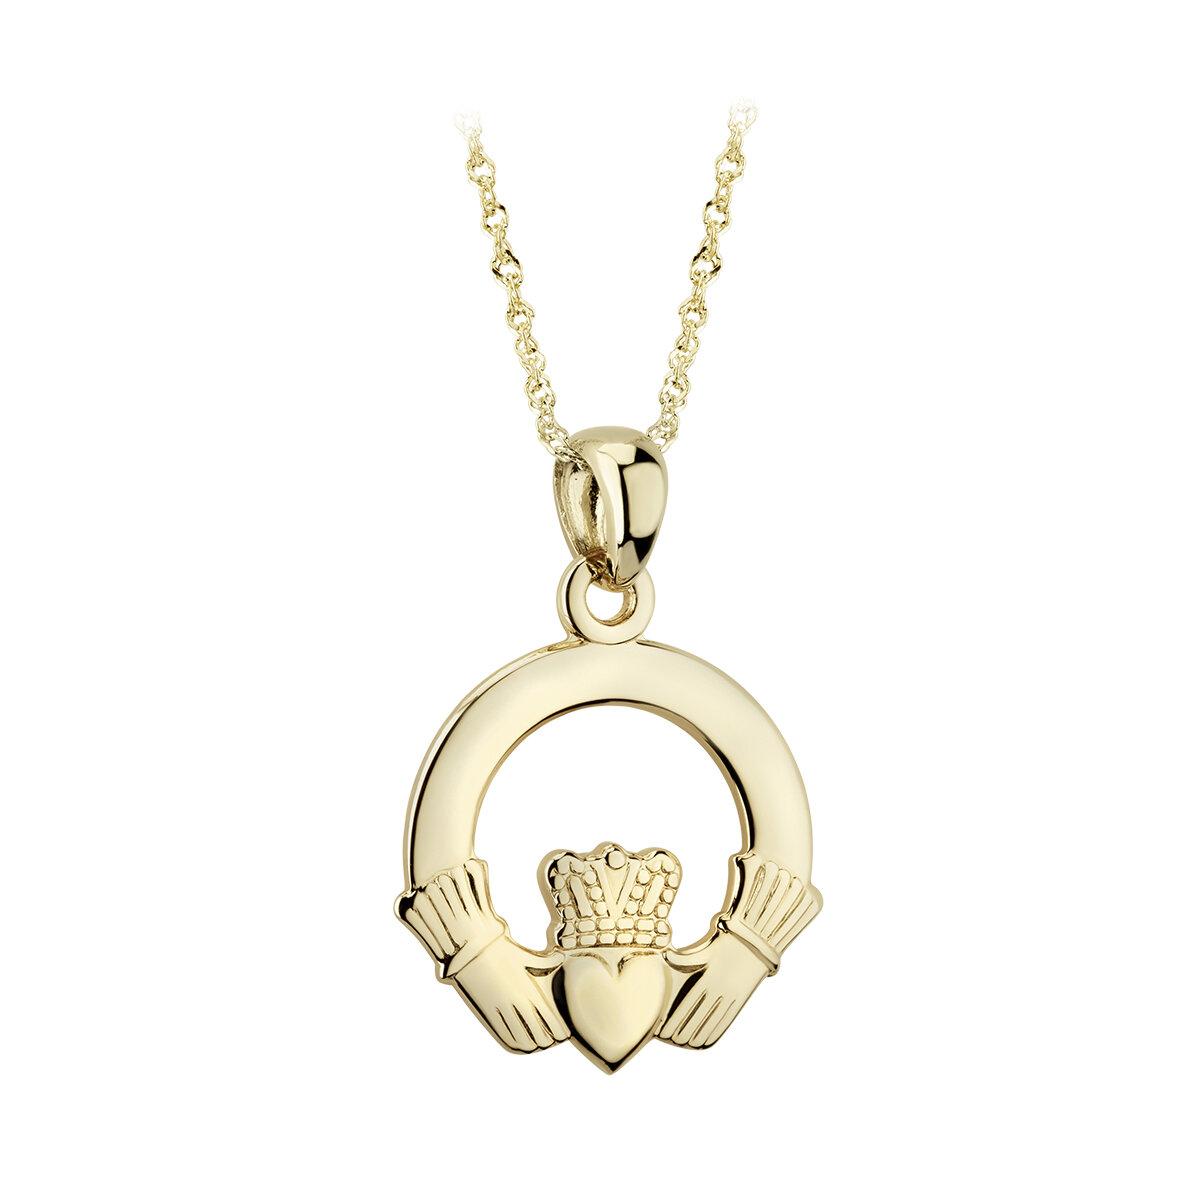 14k gold claddagh pendant s4415 from Solvar